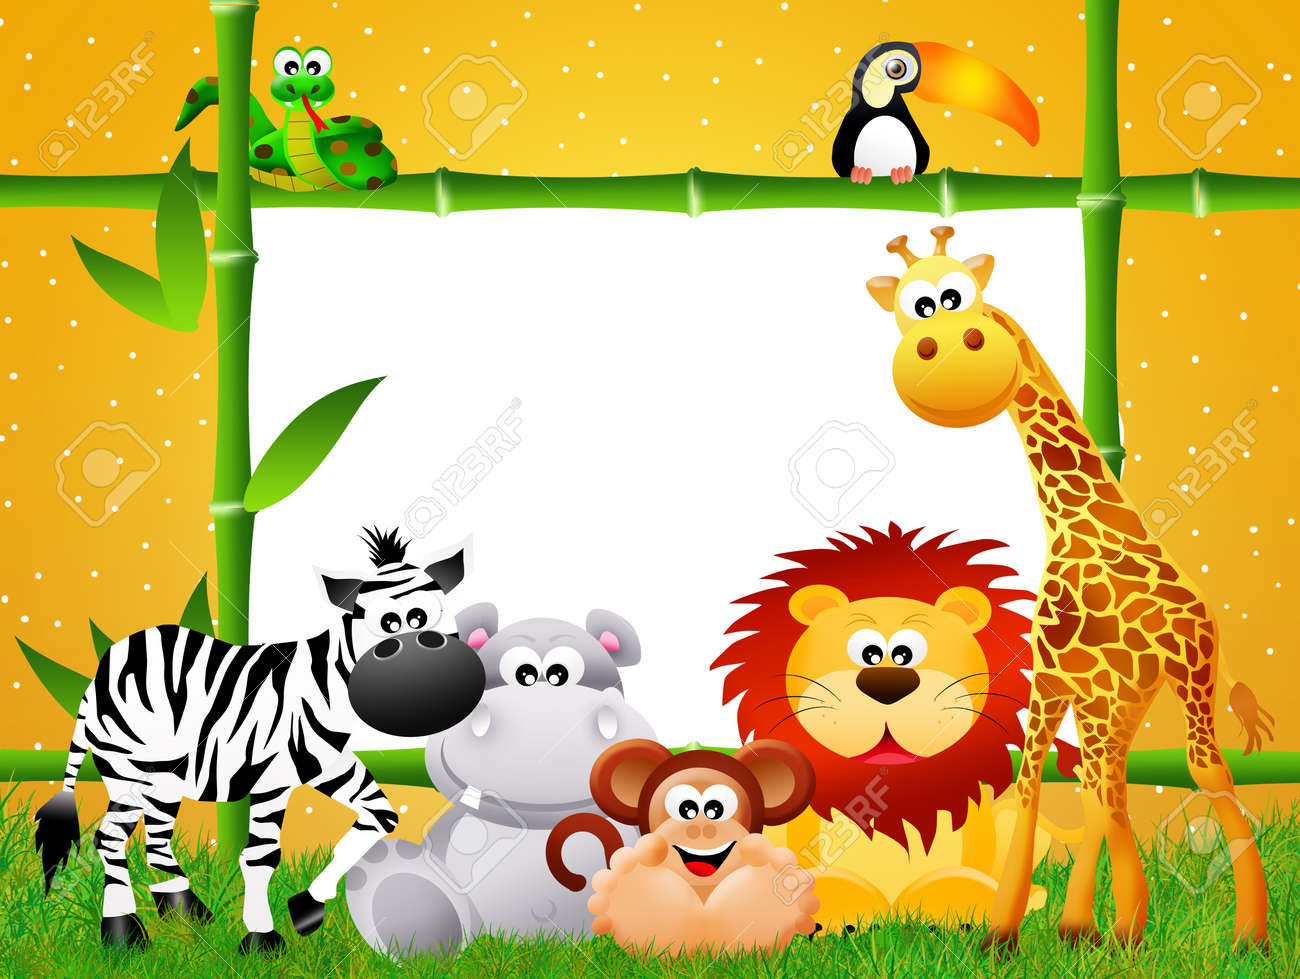 zoo animals cartoon stock photo picture and royalty free image rh 123rf com zoo animals cartoon pictures zoo animals cartoon clip art